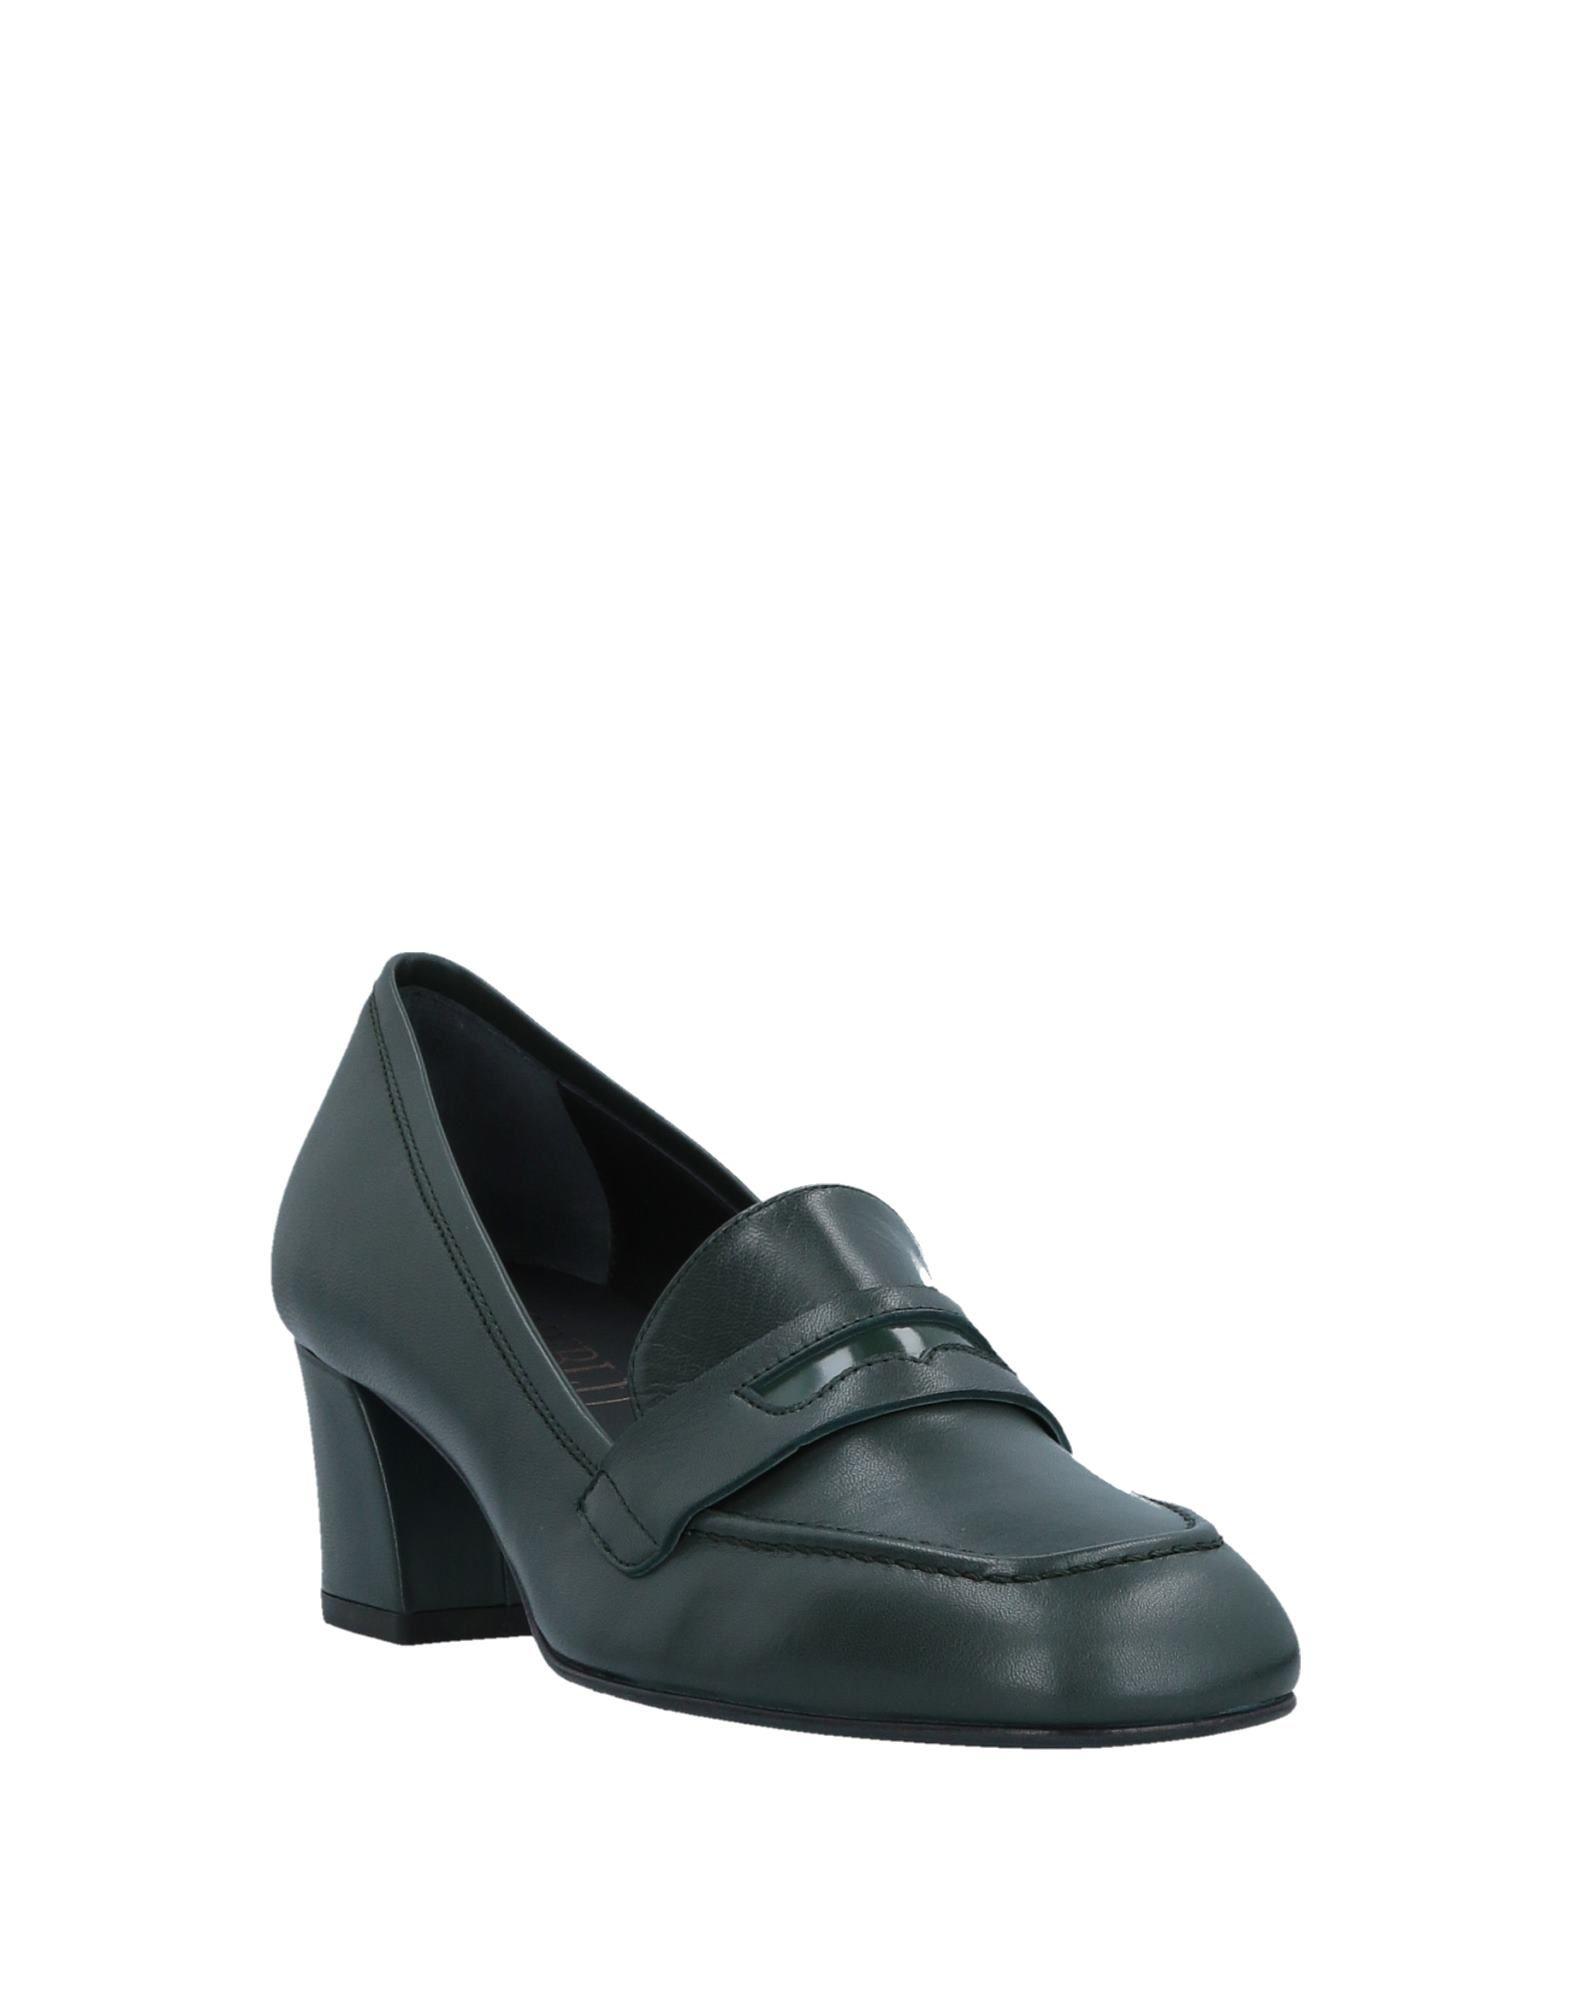 Loriblu Mokassins Damen Schuhe  11520334GAGut aussehende strapazierfähige Schuhe Damen bbe2bf